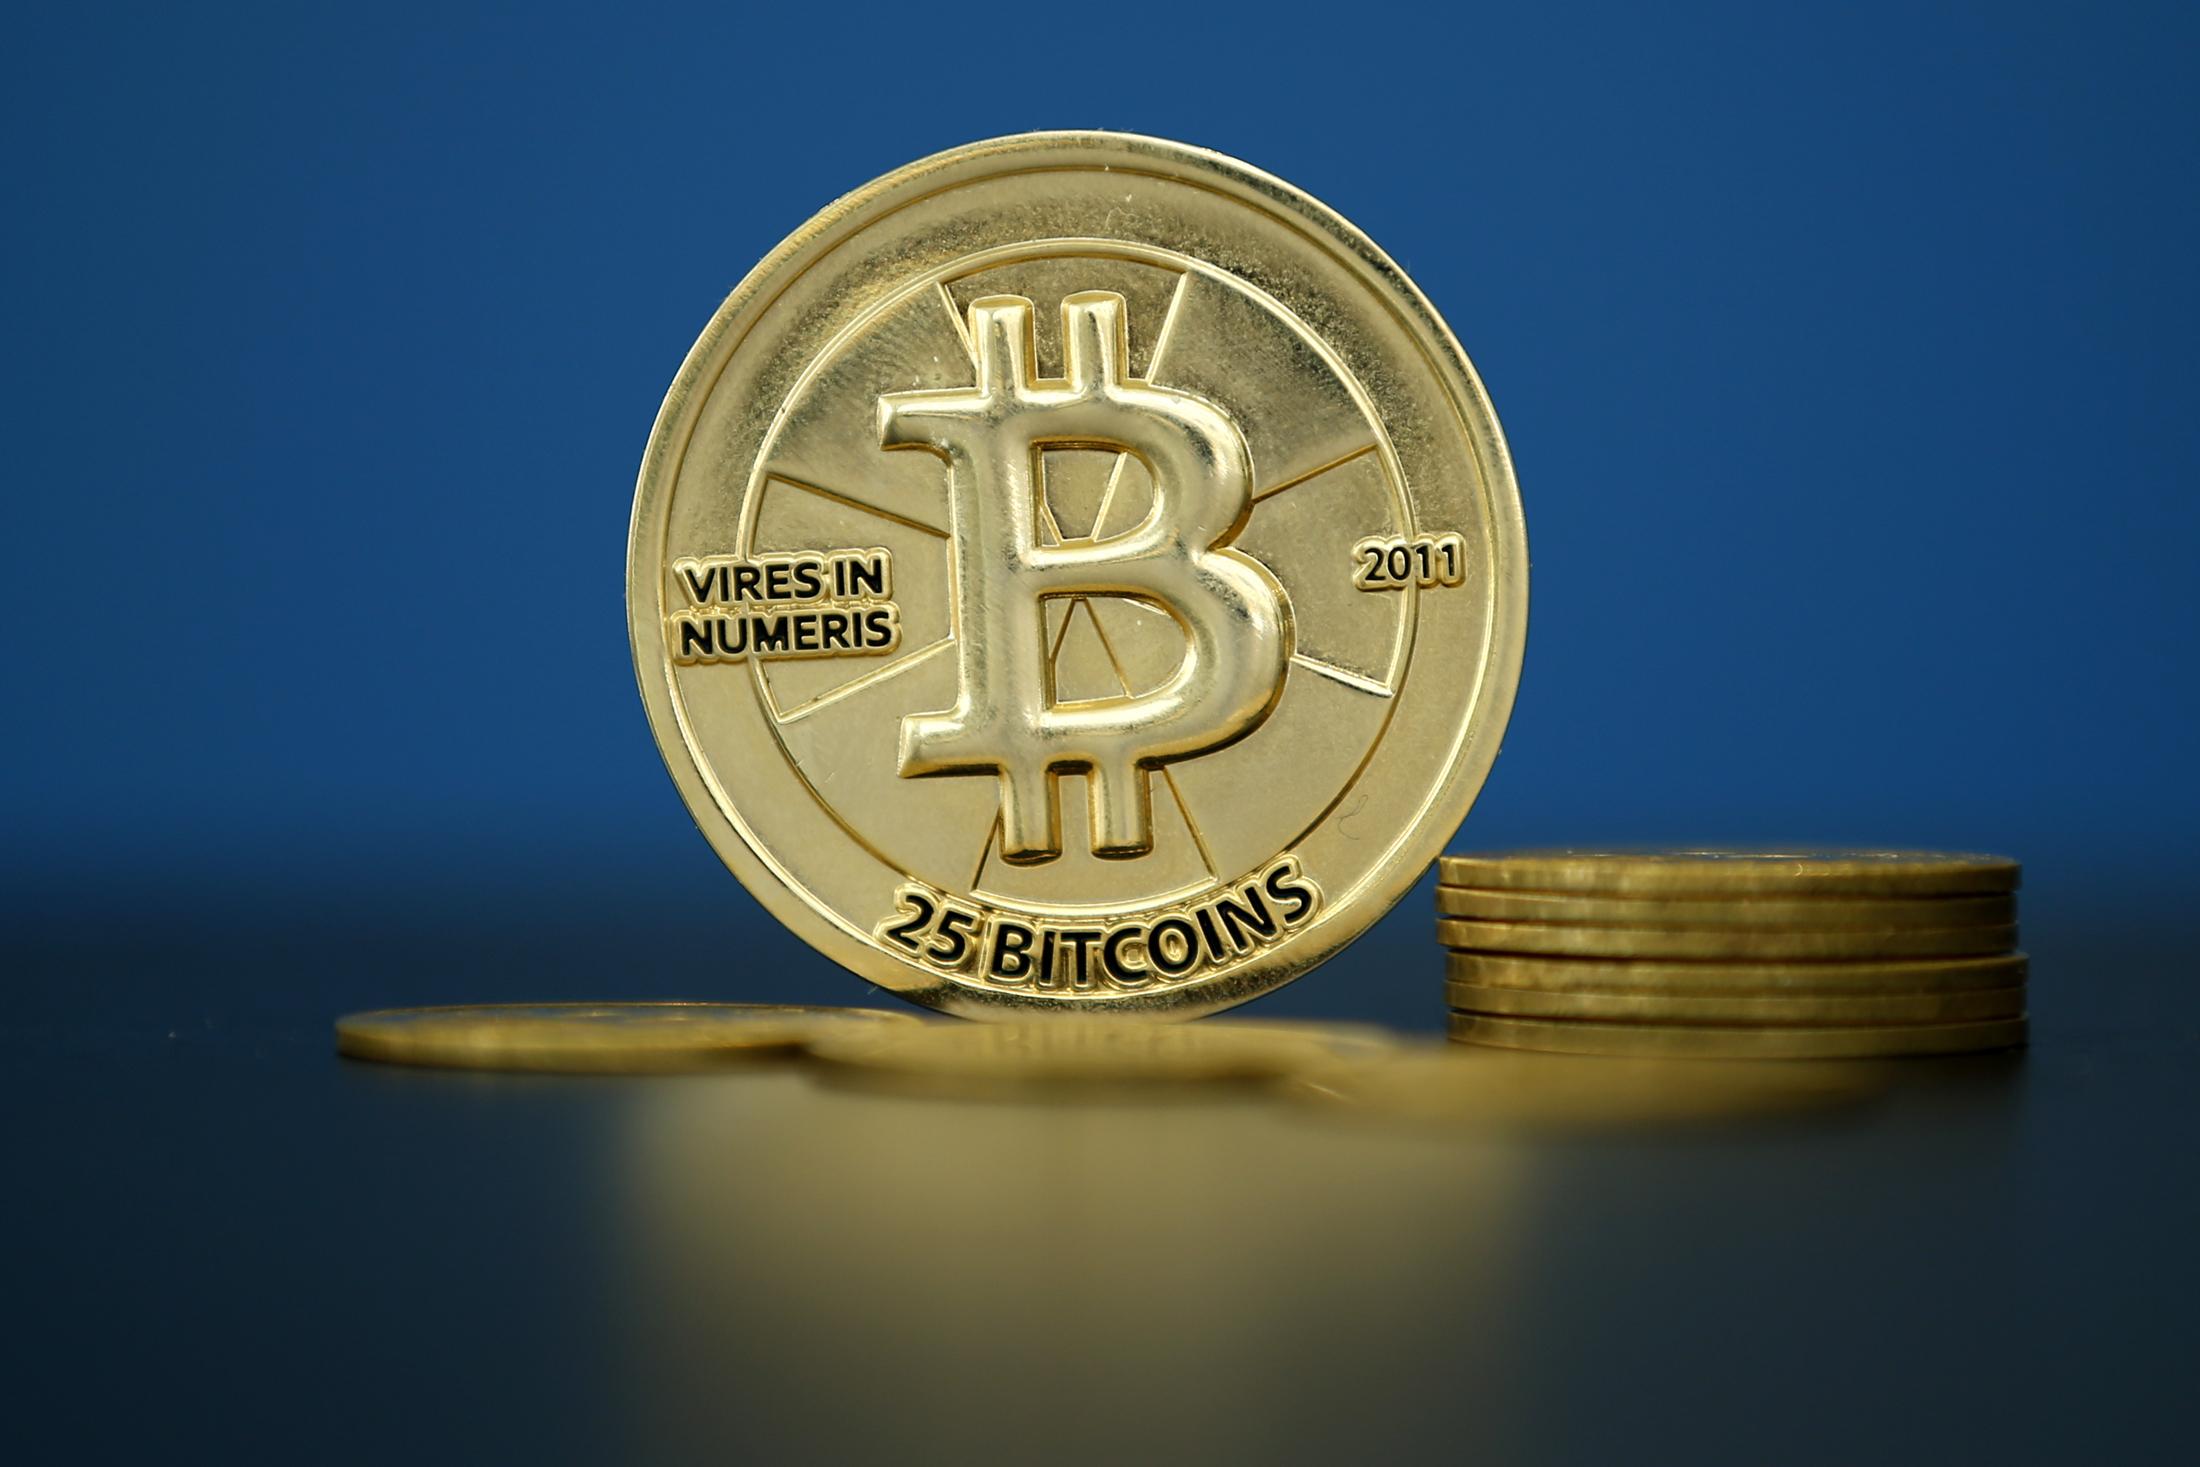 0 09 btc a inr operazioni di trading bitcoin